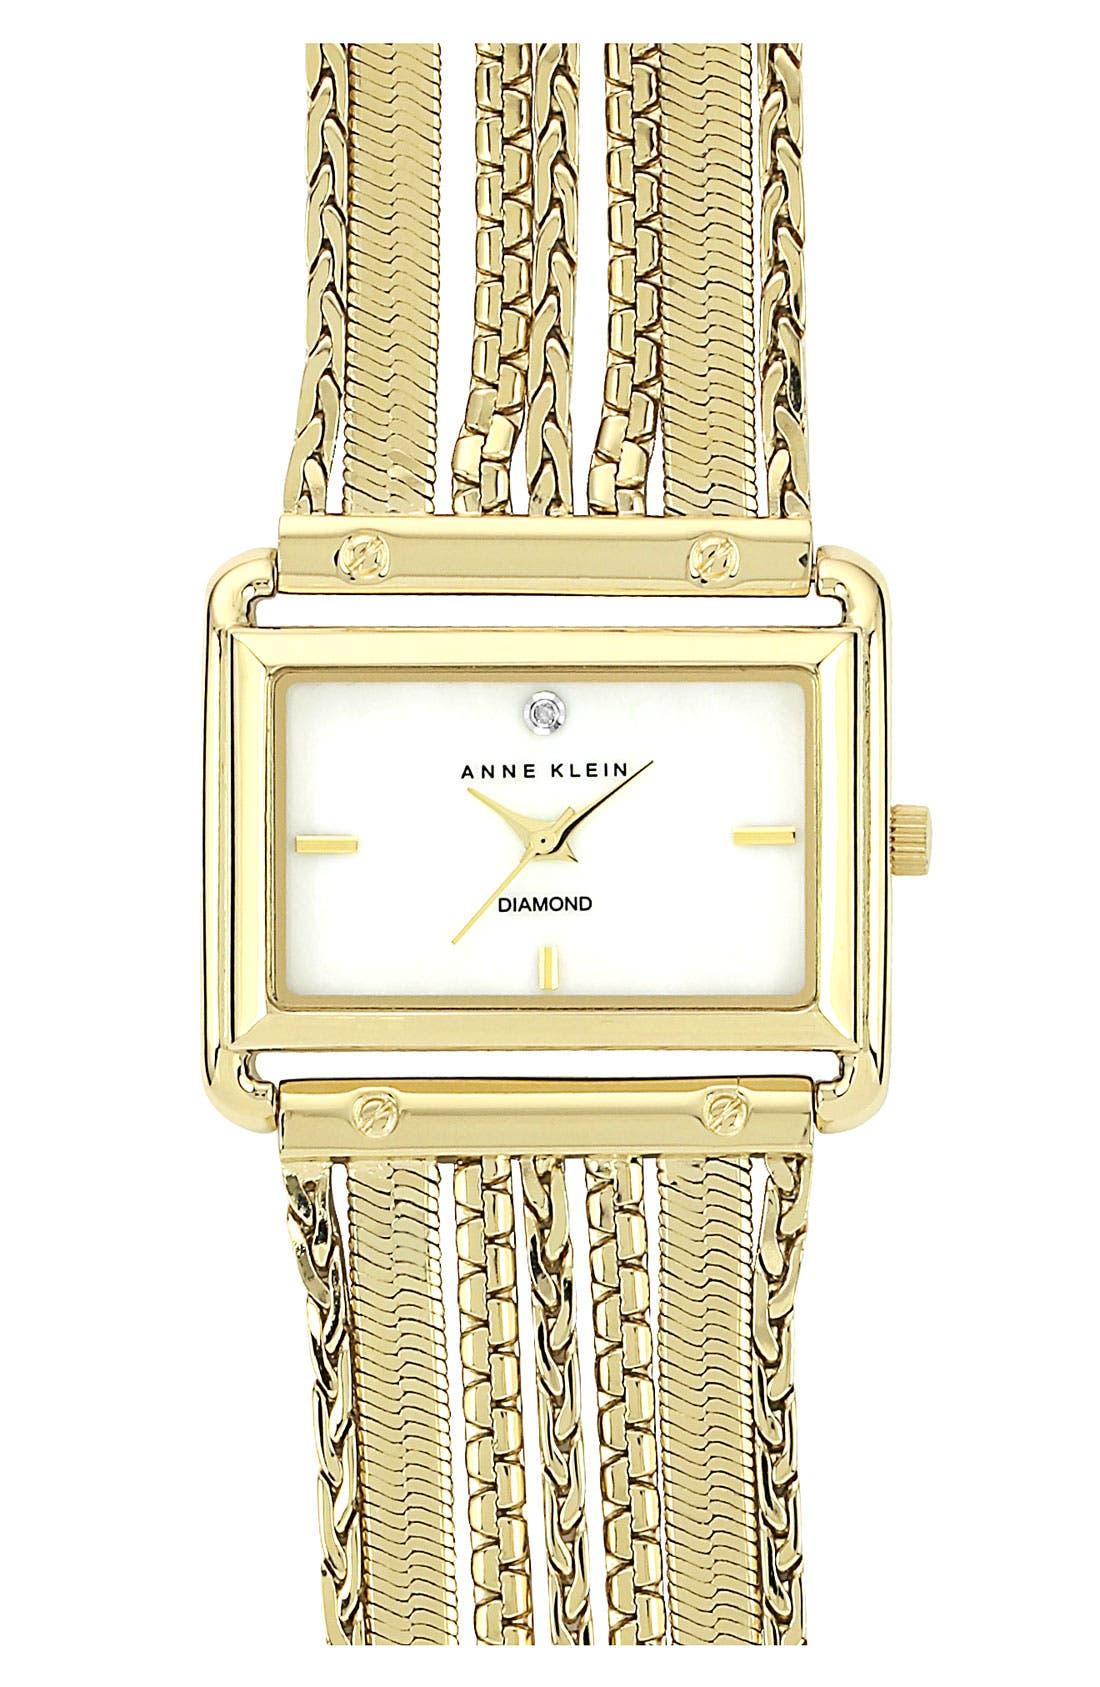 Main Image - Anne Klein Square Chain Bracelet Watch